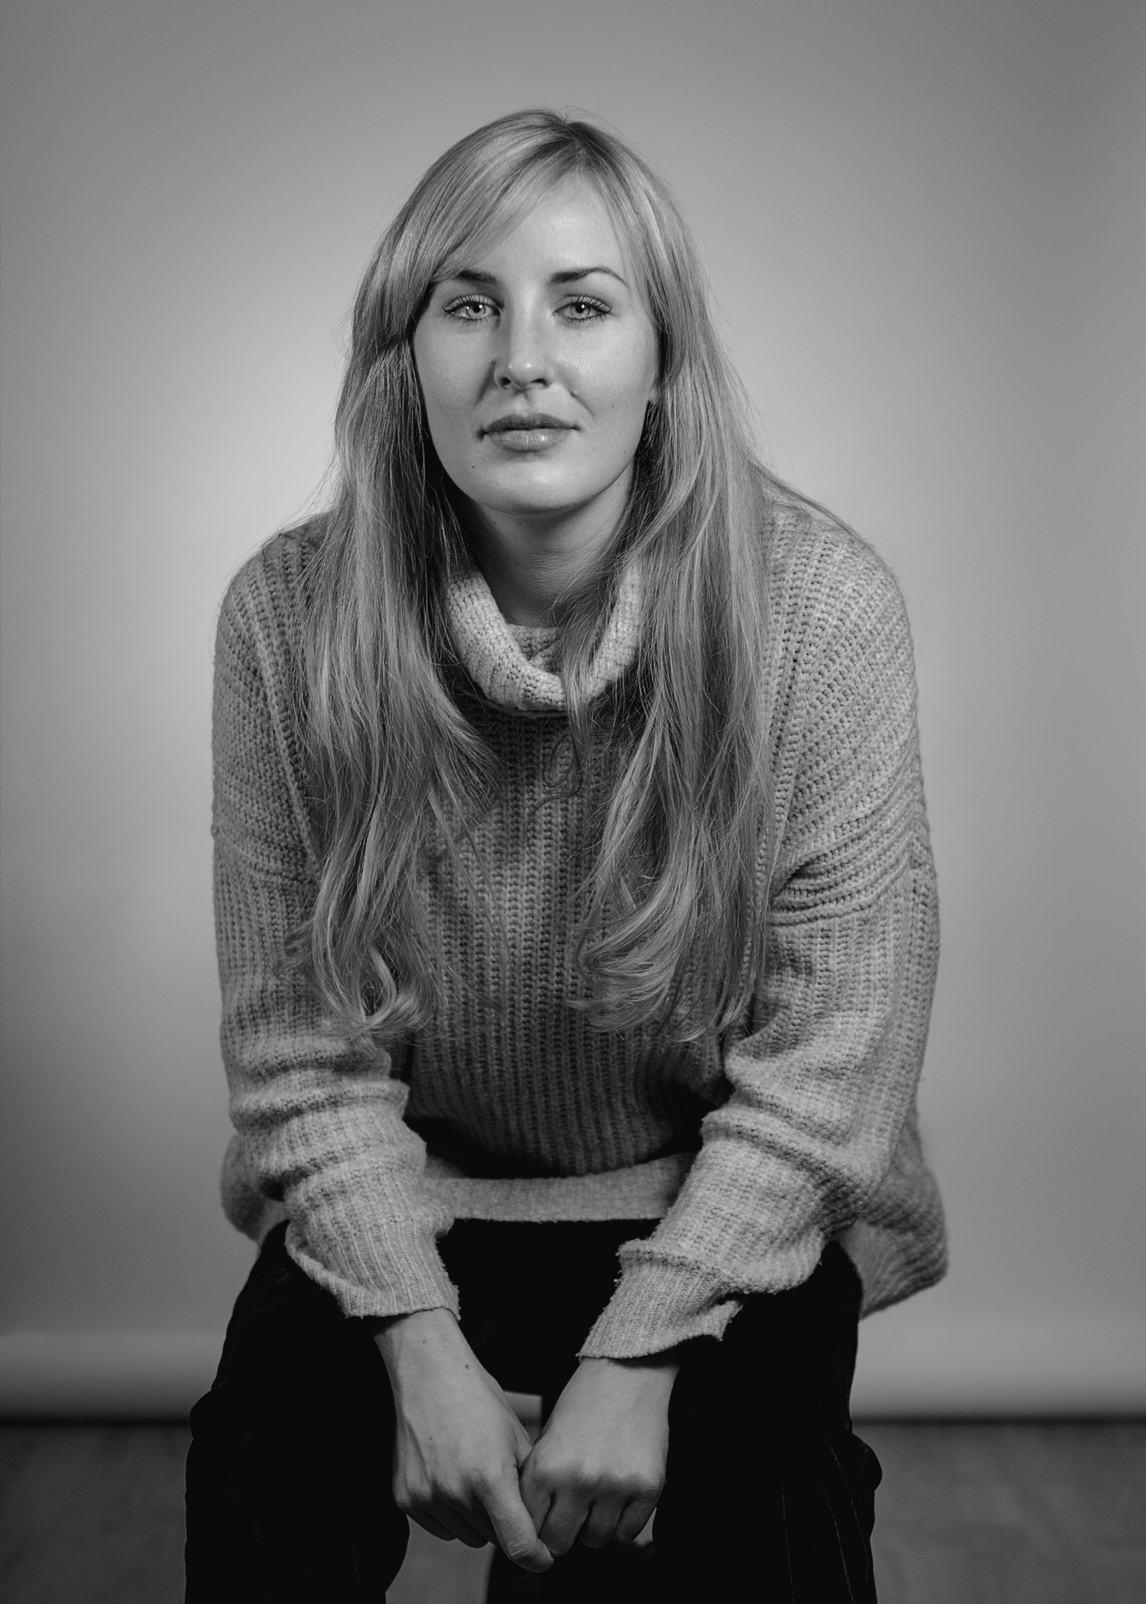 Briony O'Callaghan